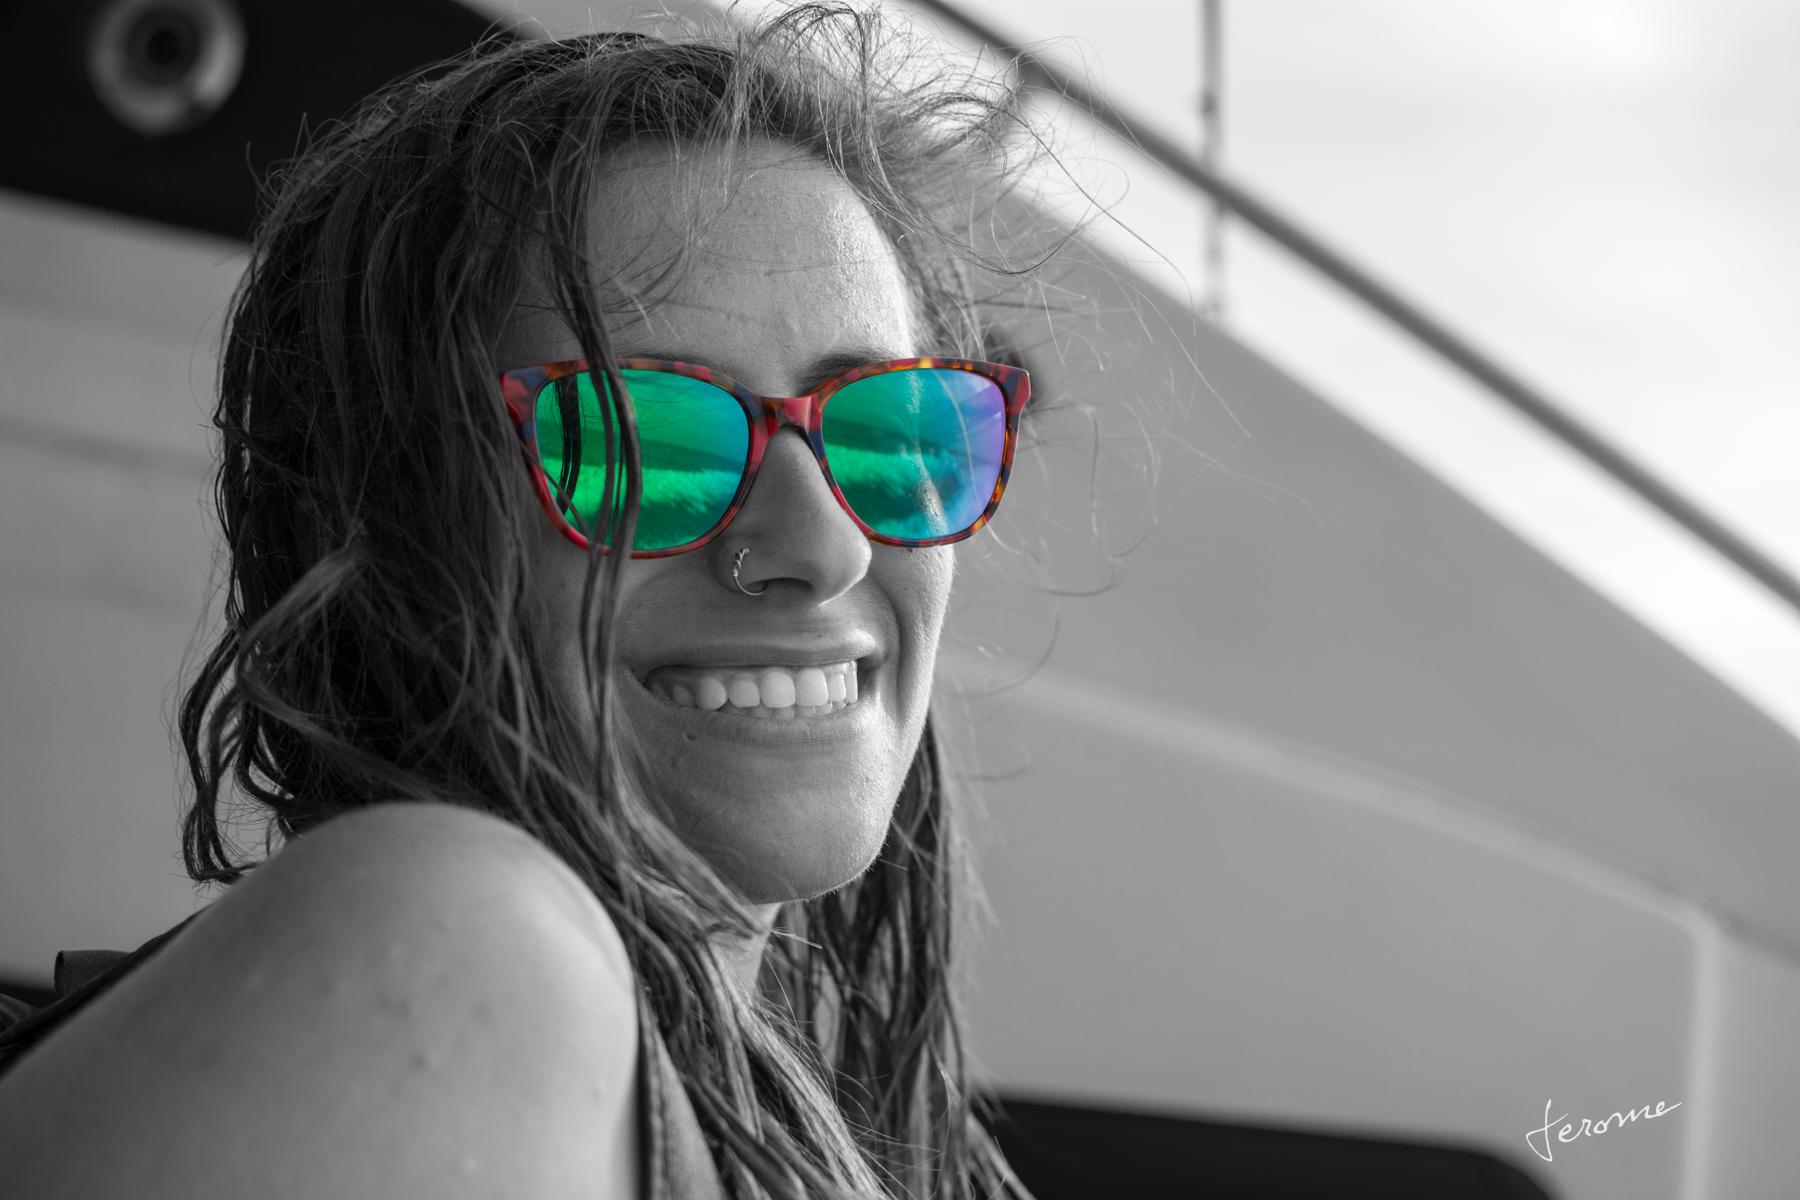 https://0901.nccdn.net/4_2/000/000/064/d40/as-cool-as-the-sun-col-glasses-4x6.jpg